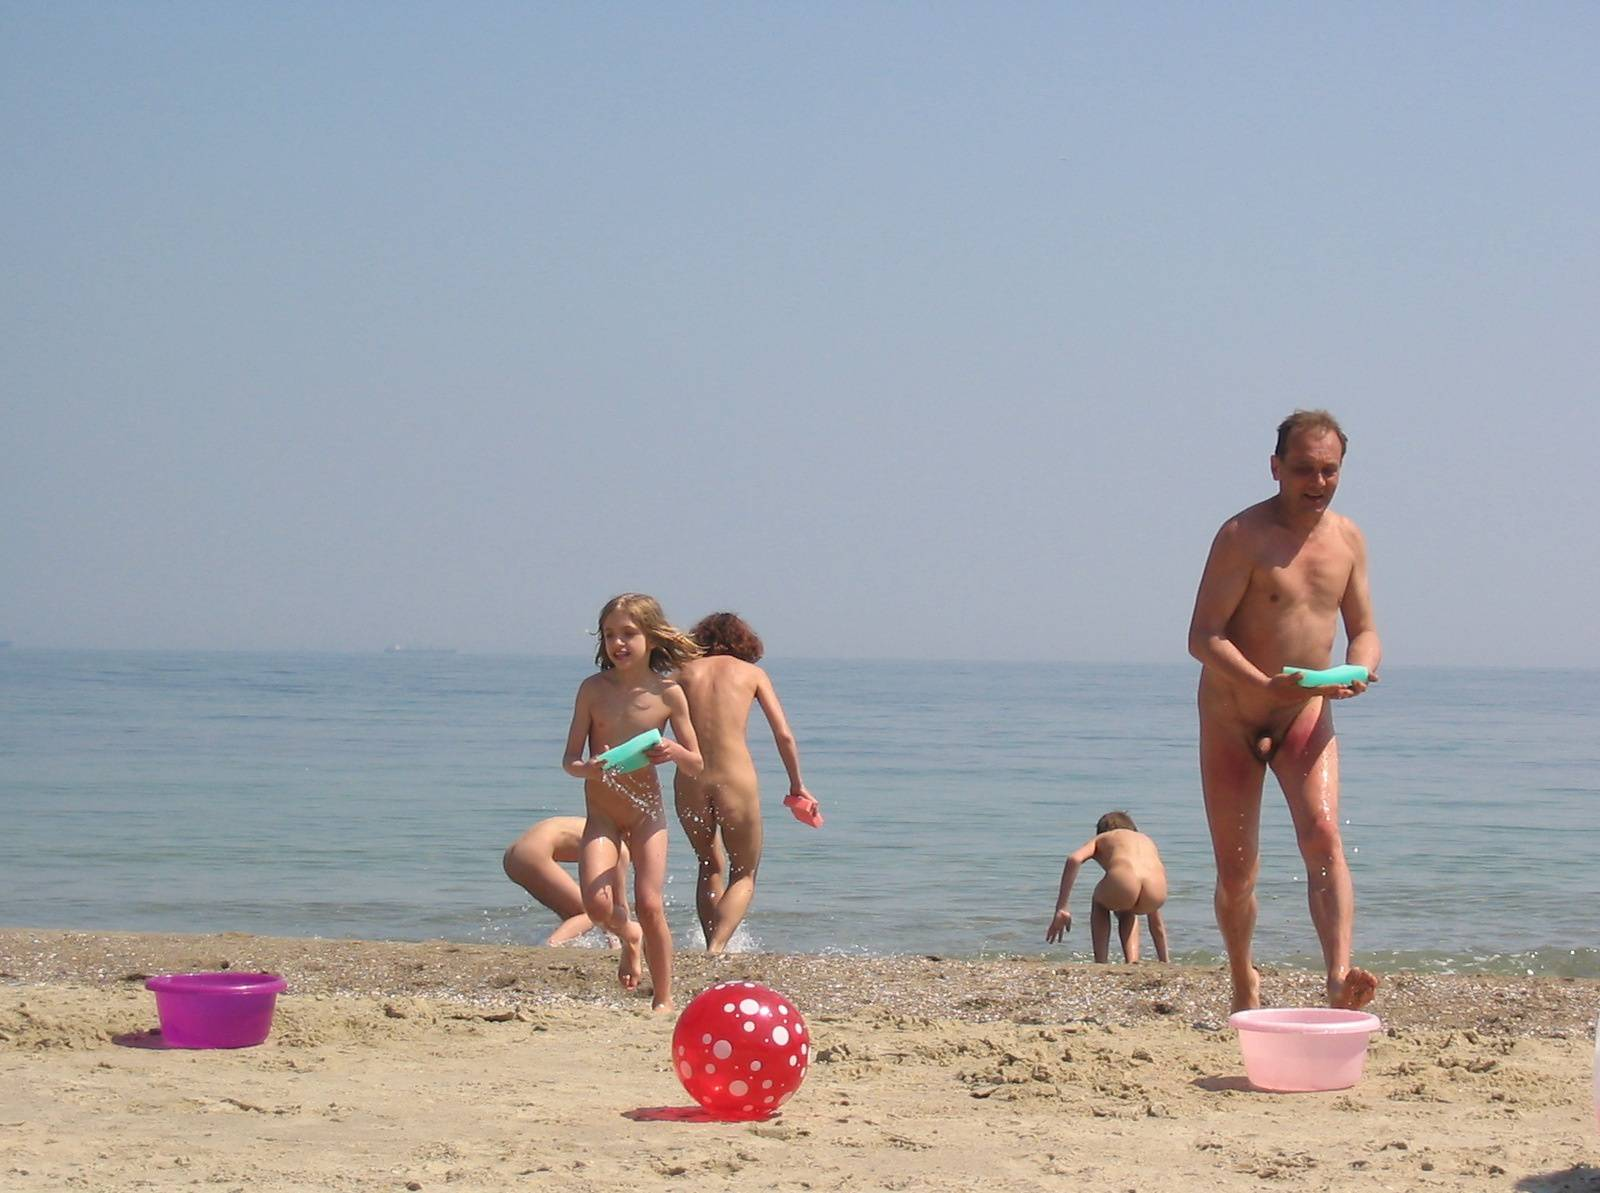 Naturist Beach Ball Profile - 2